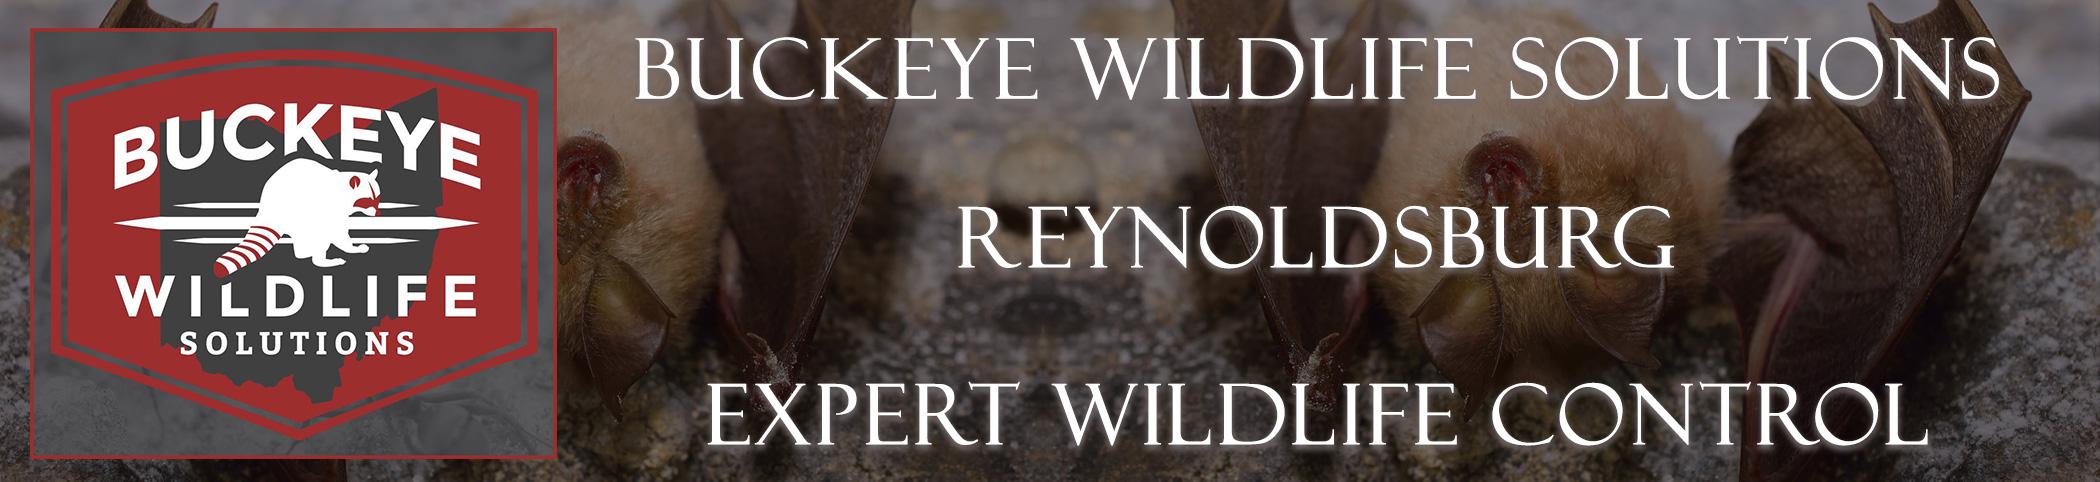 Reynoldsburg-buckeye-wildlife-solutions-ohio-header-image